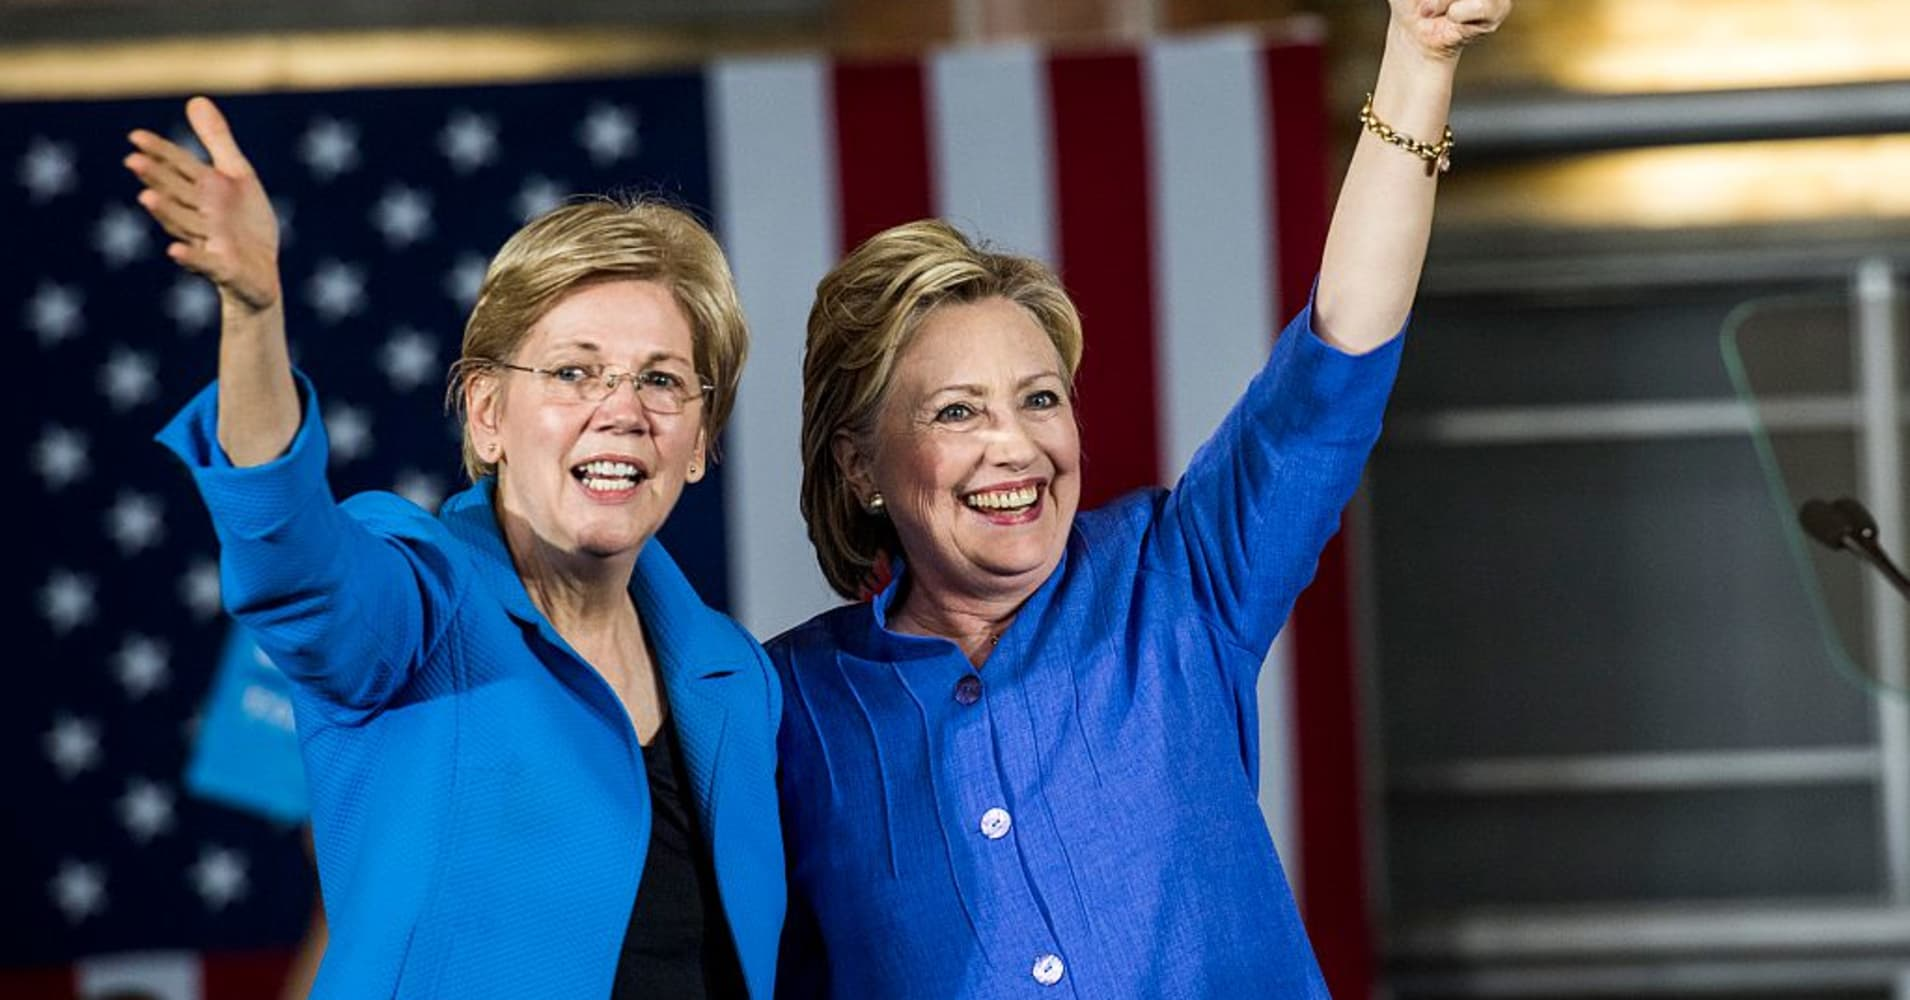 Op-Ed: Why Elizabeth Warren is no longer the darling of the left